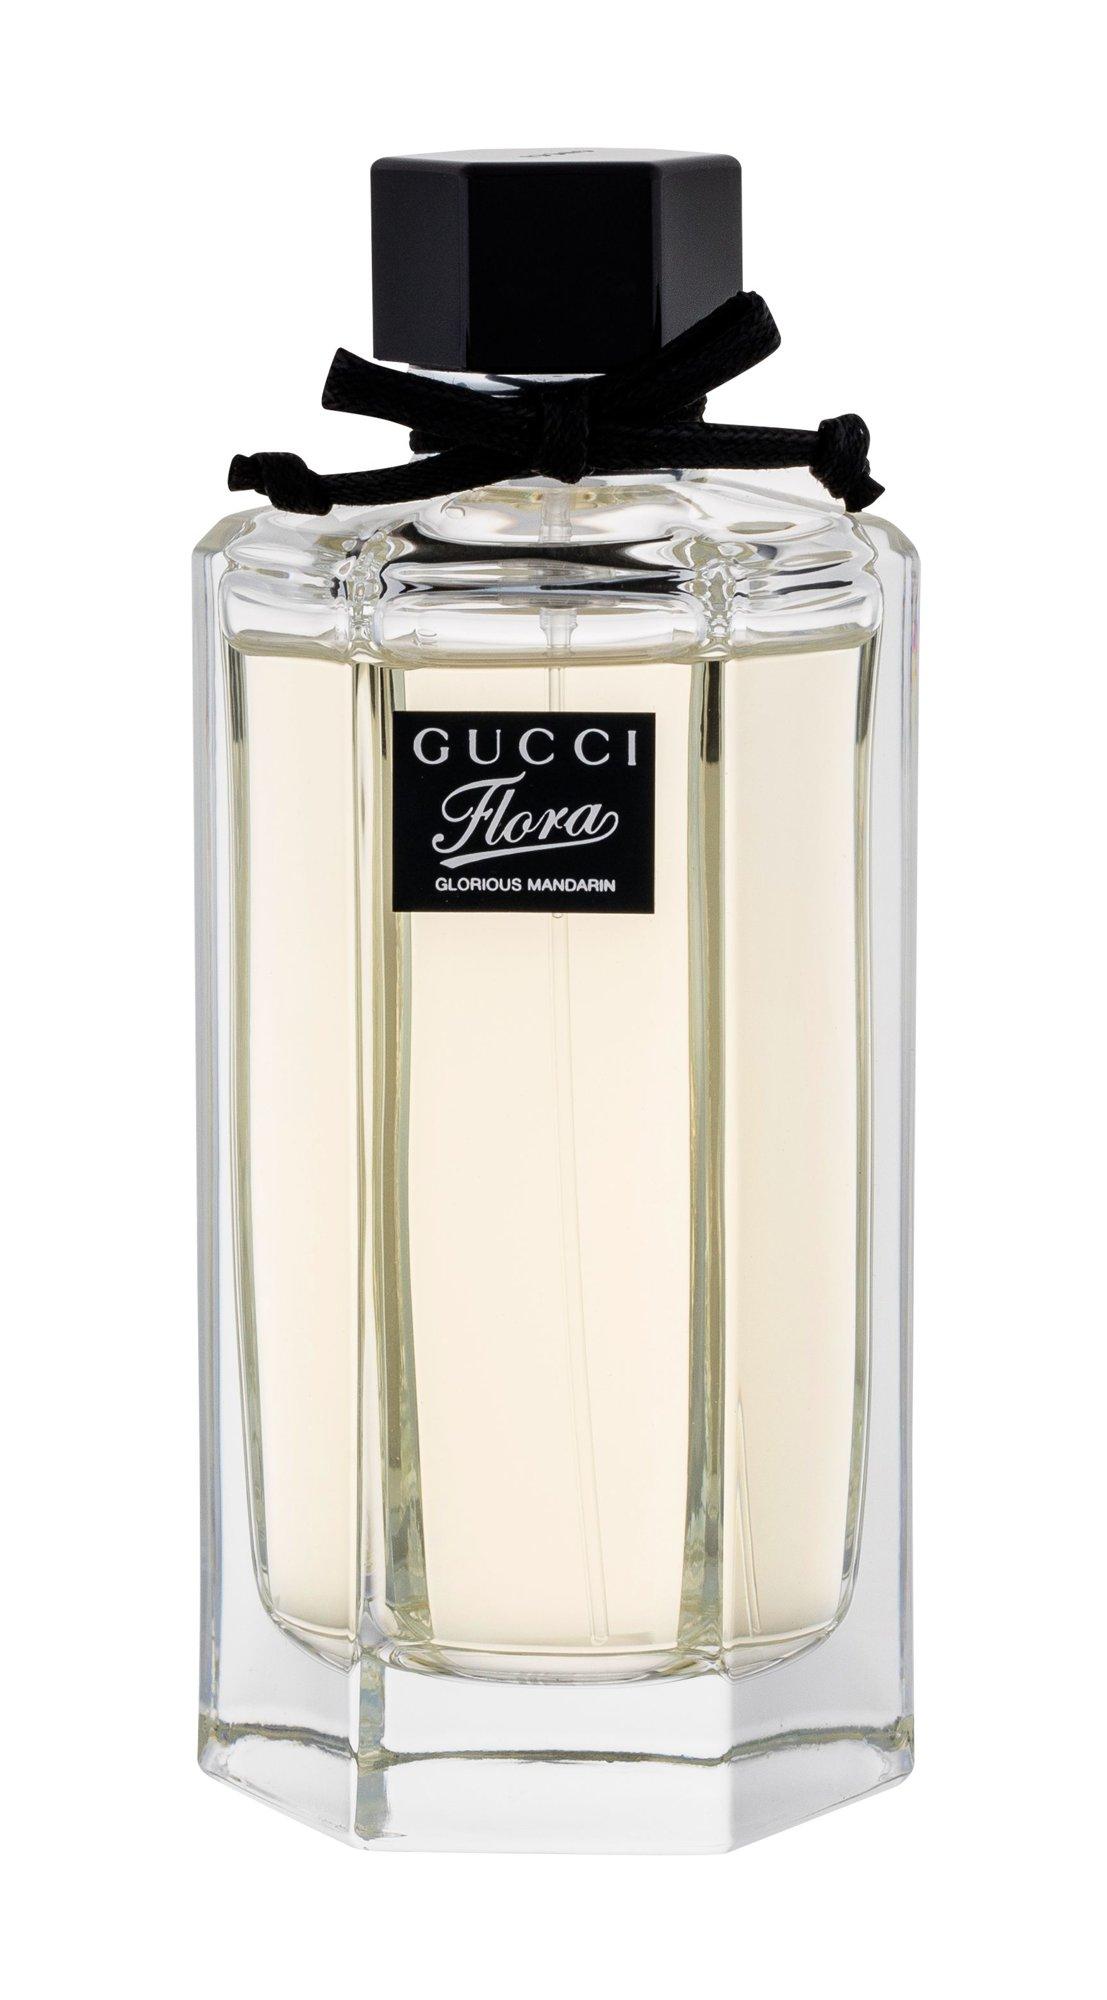 Gucci Flora by Gucci Glorious Mandarin Eau de Toilette 100ml